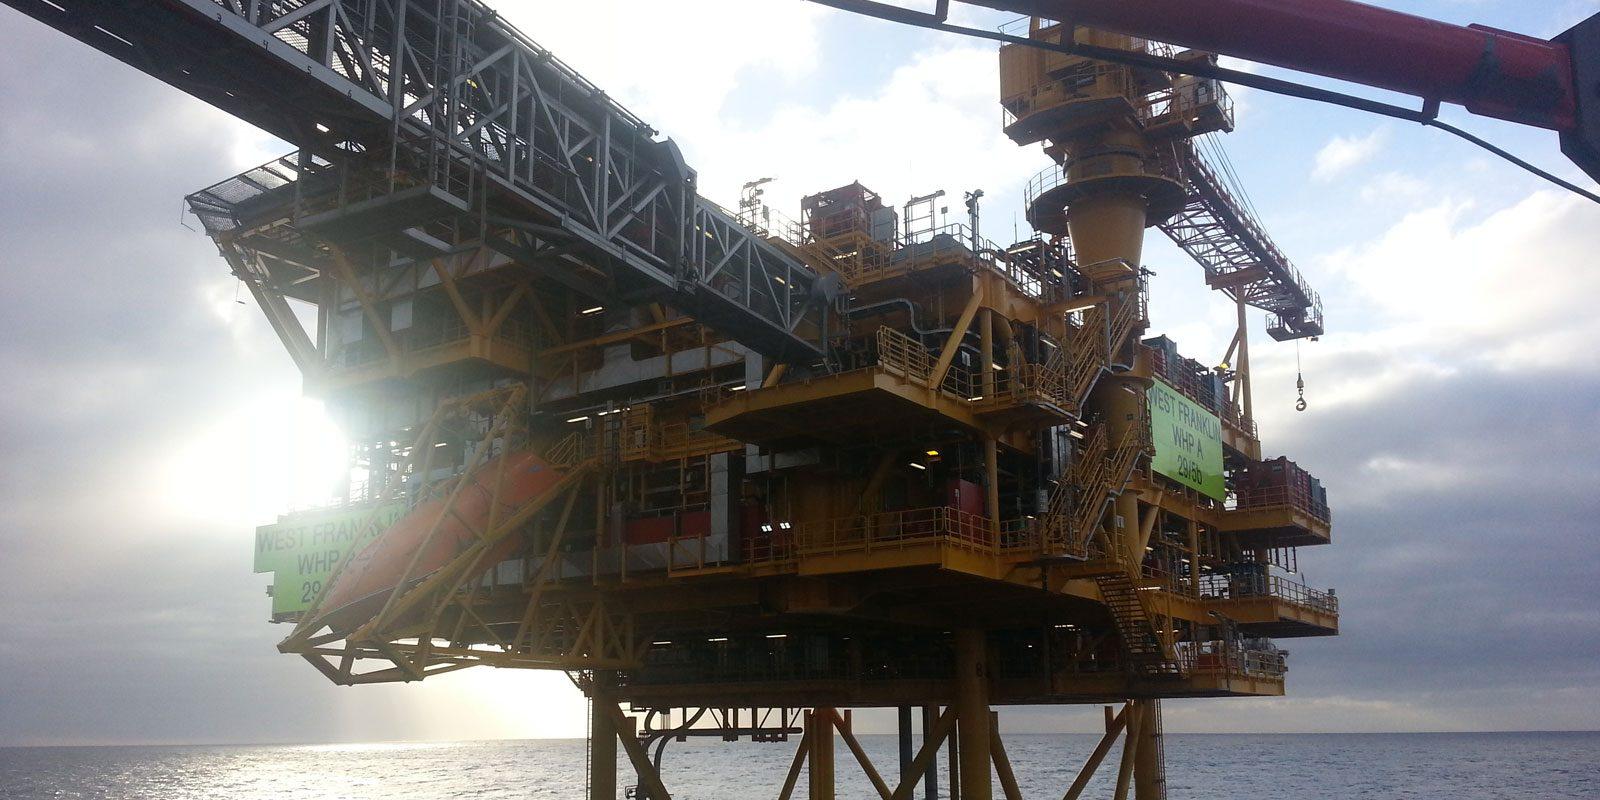 Проект Elgin Franklin offshore field